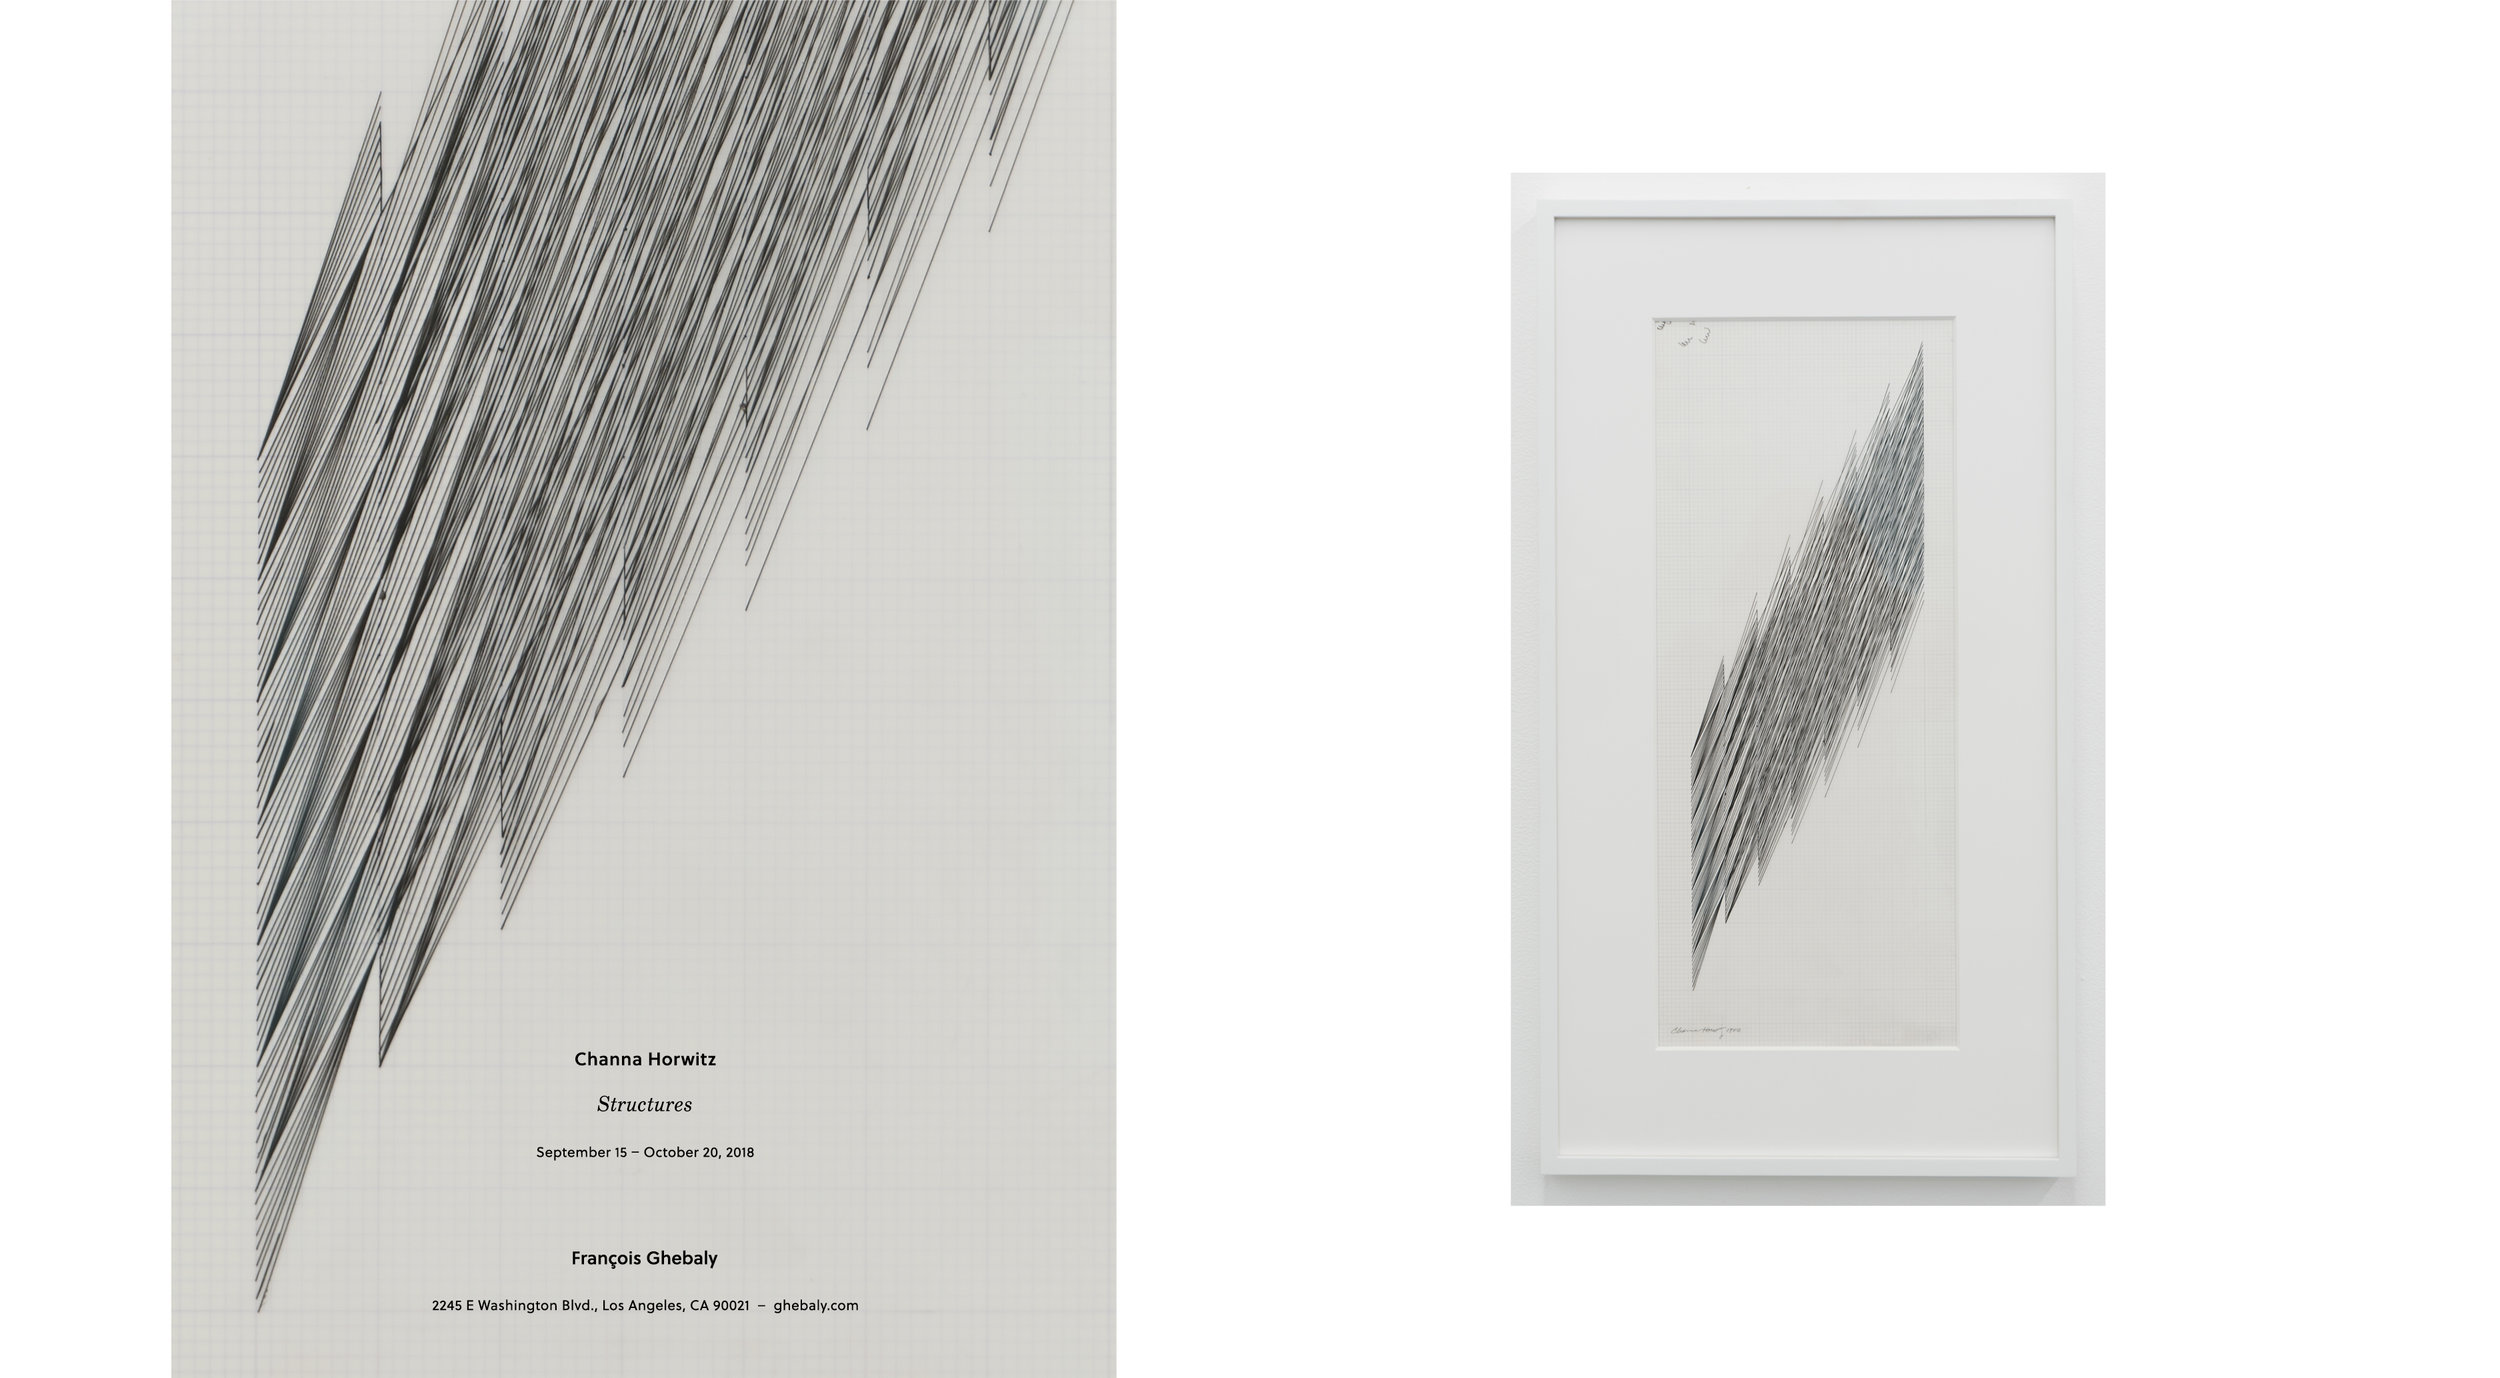 Francois-Ghebaly-Channa-Horwitz-Ad.jpg